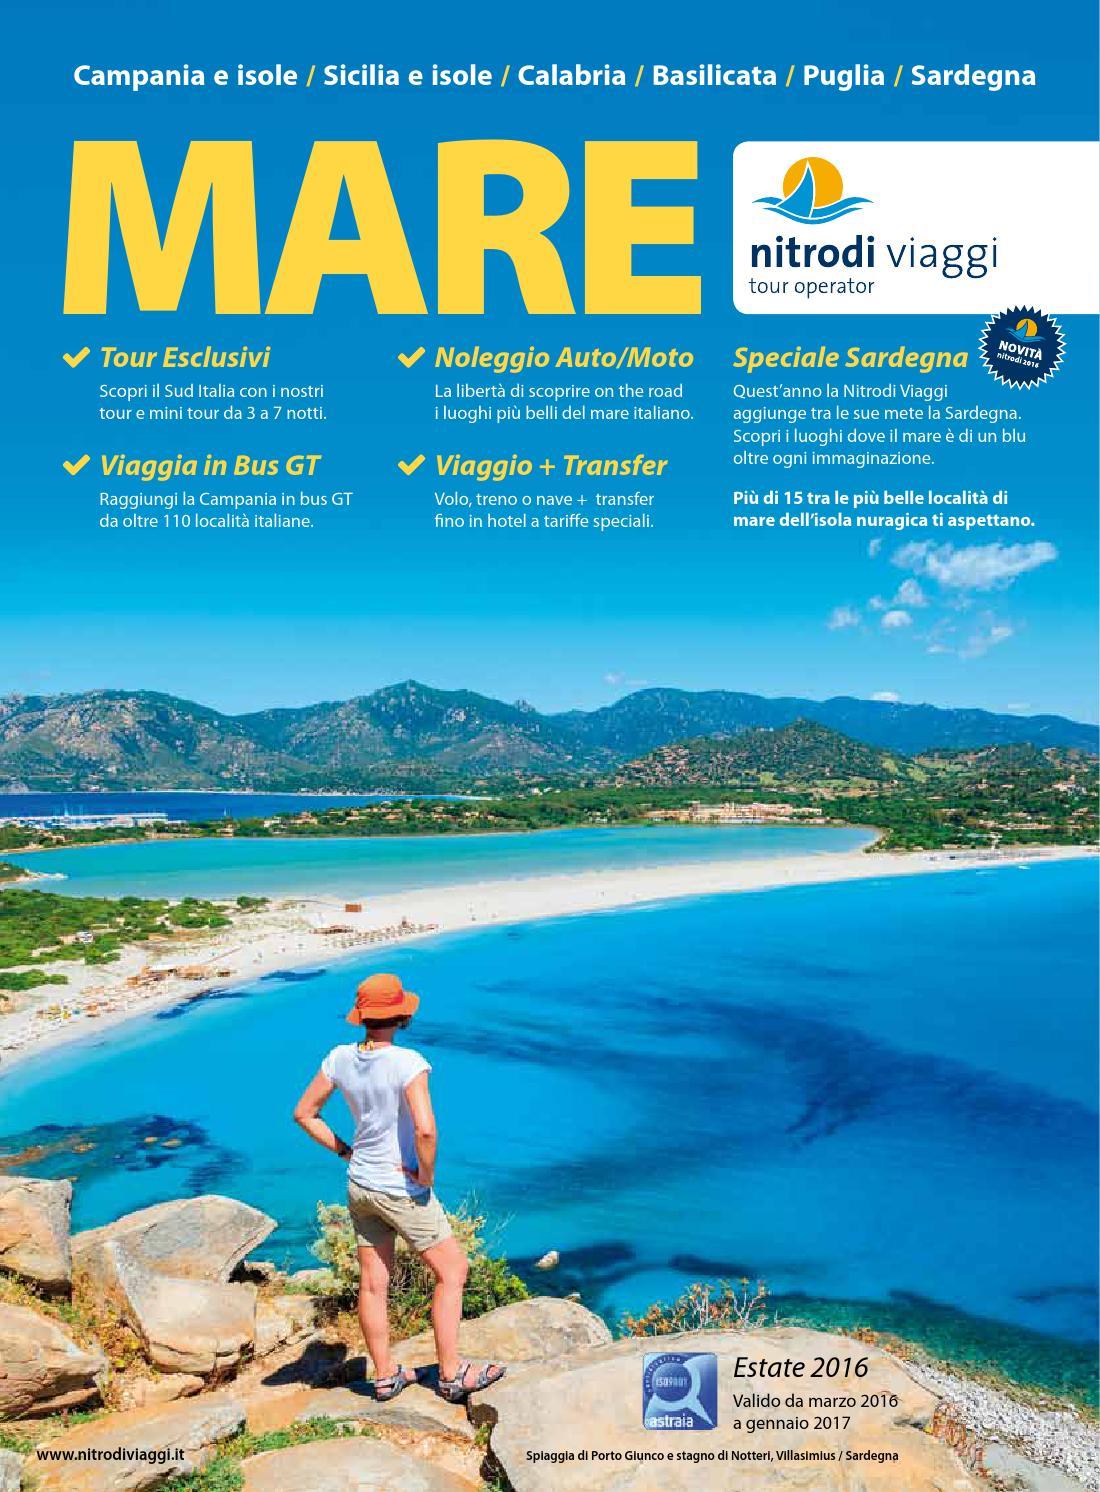 6406ede469c120 Catalogo Mare 2016 - Nitrodi Viaggi by Nitrodi Viaggi S.r.l. - Tour  Operator - issuu